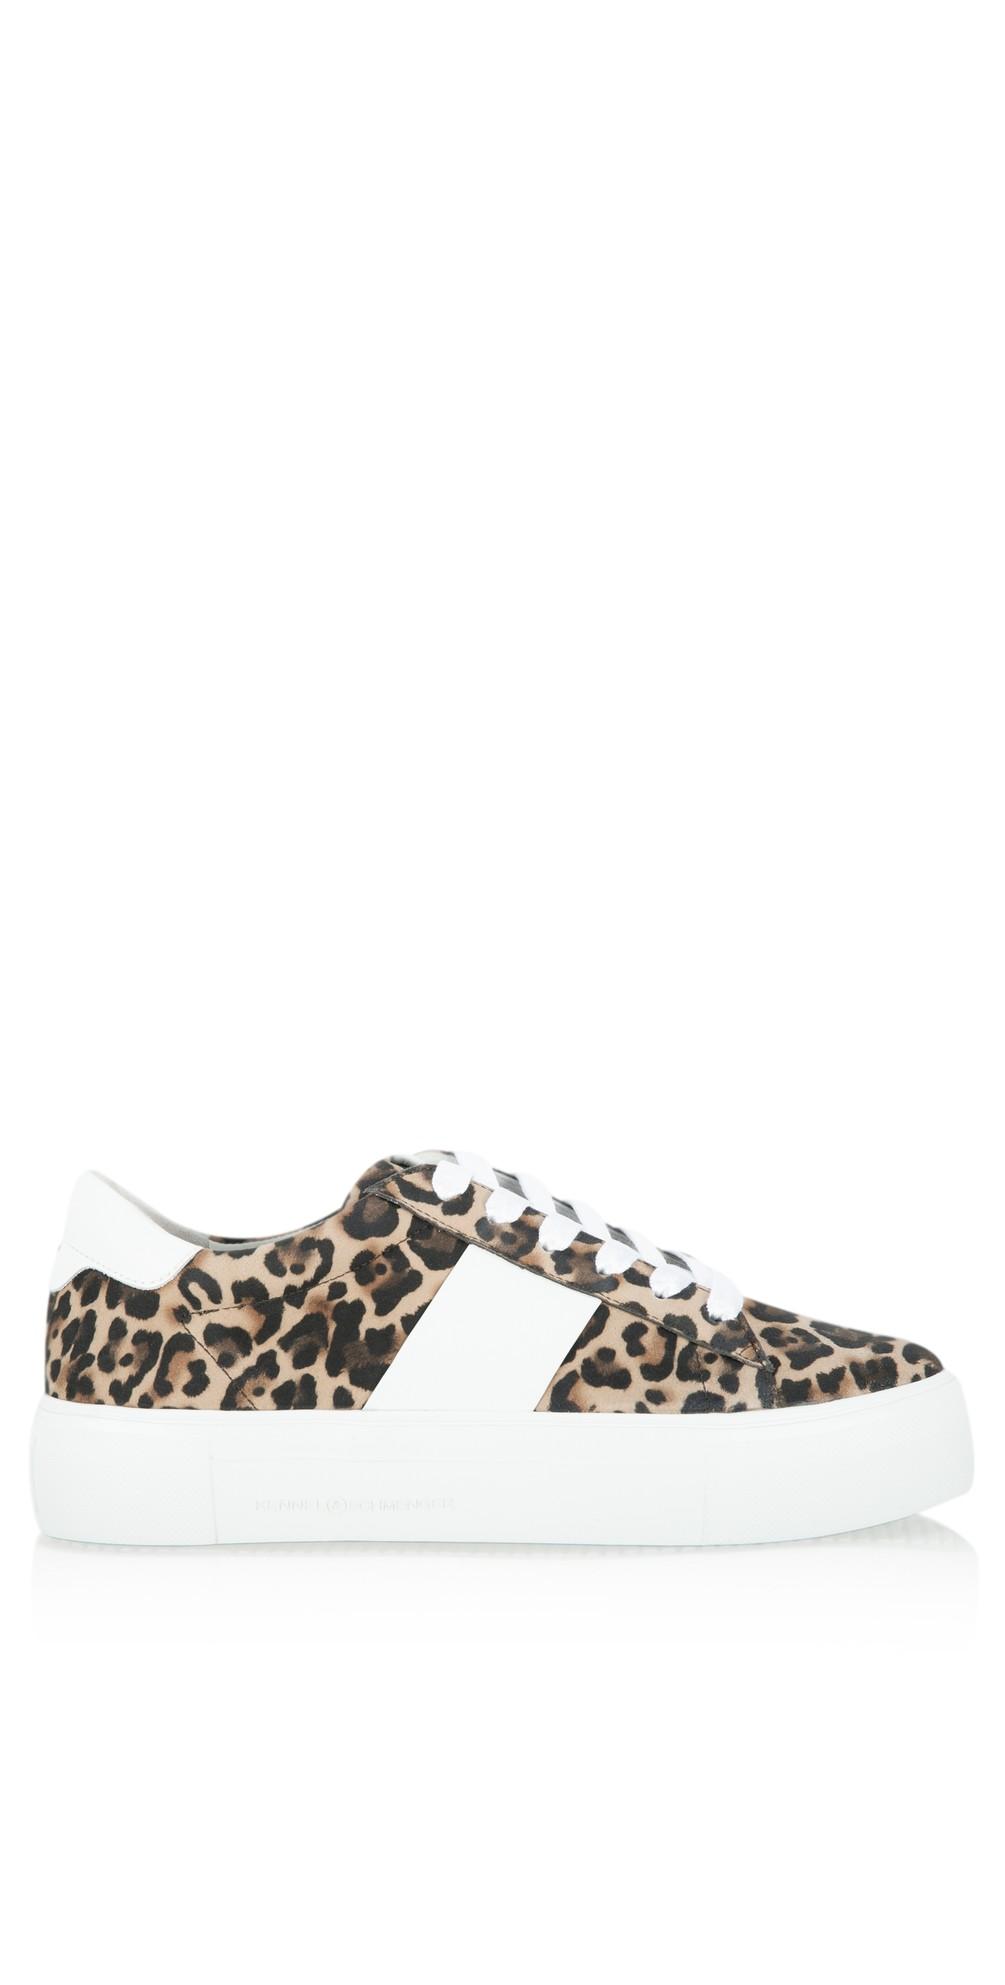 Big Leopard Print Trainer Shoe main image